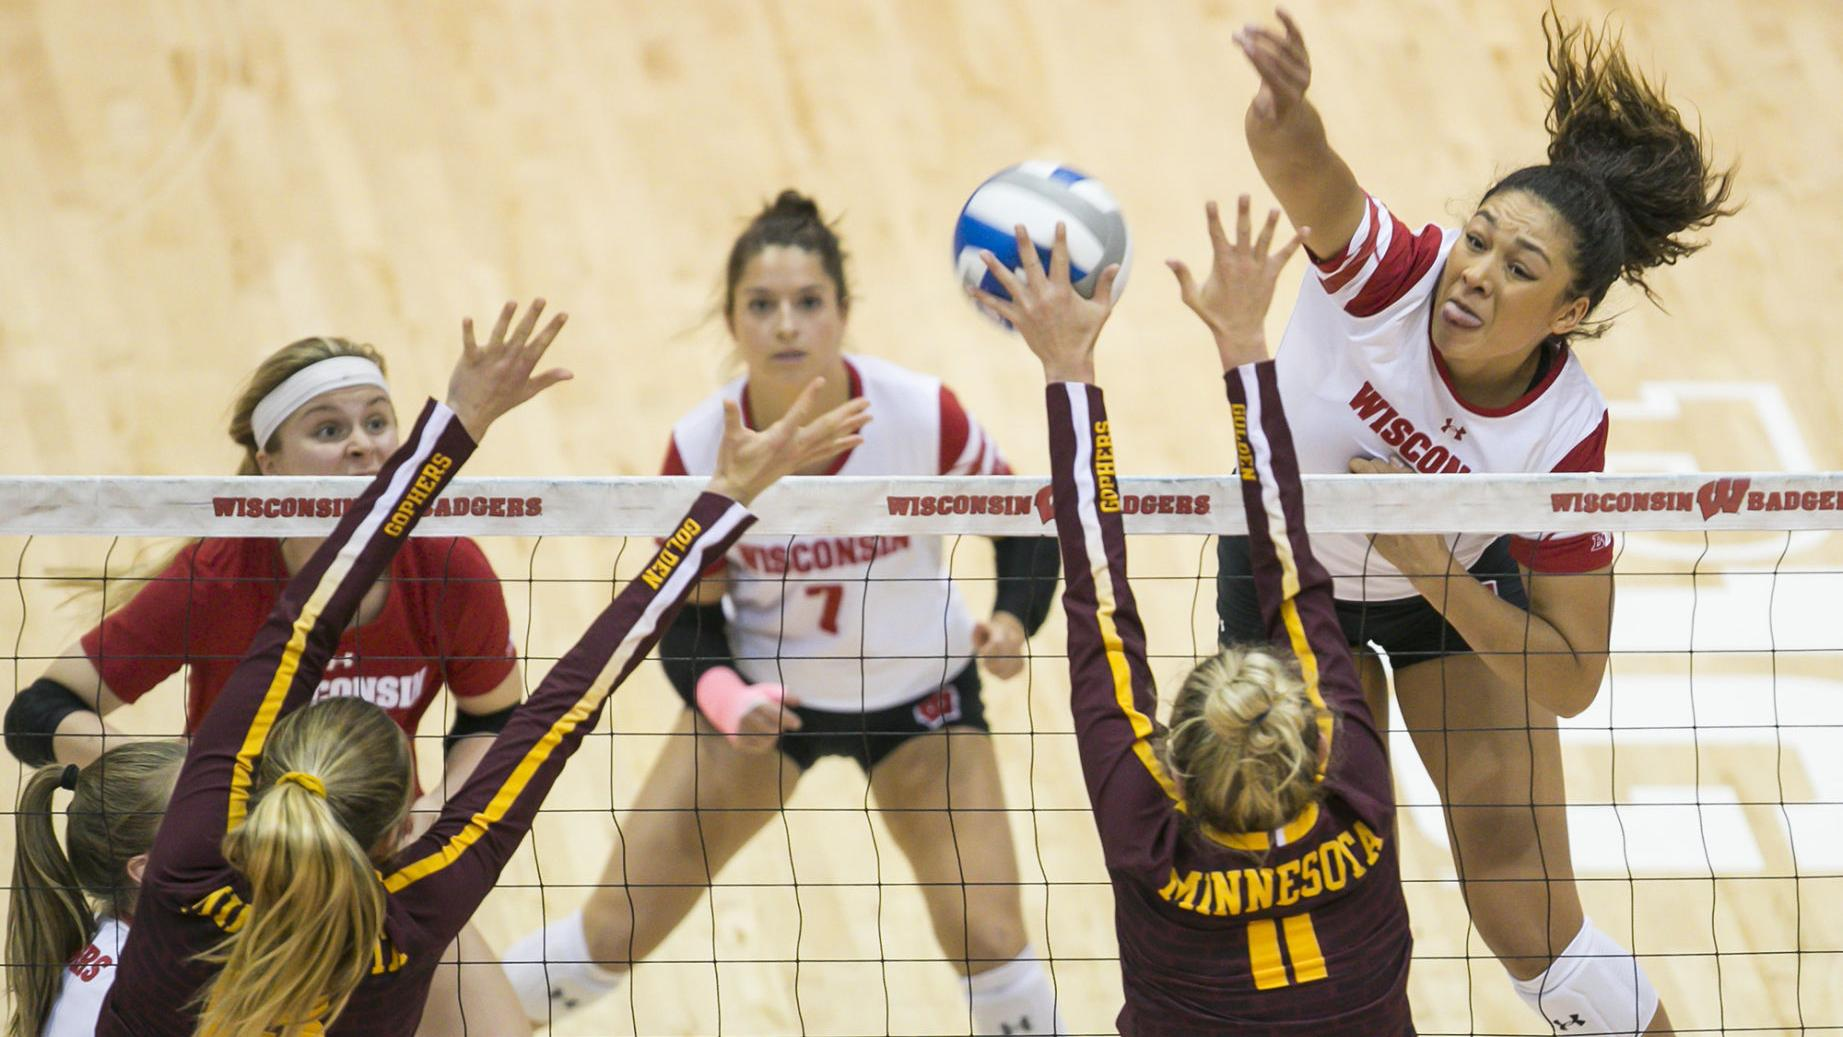 Badgers volleyball: Preview of UW match against Nebraska